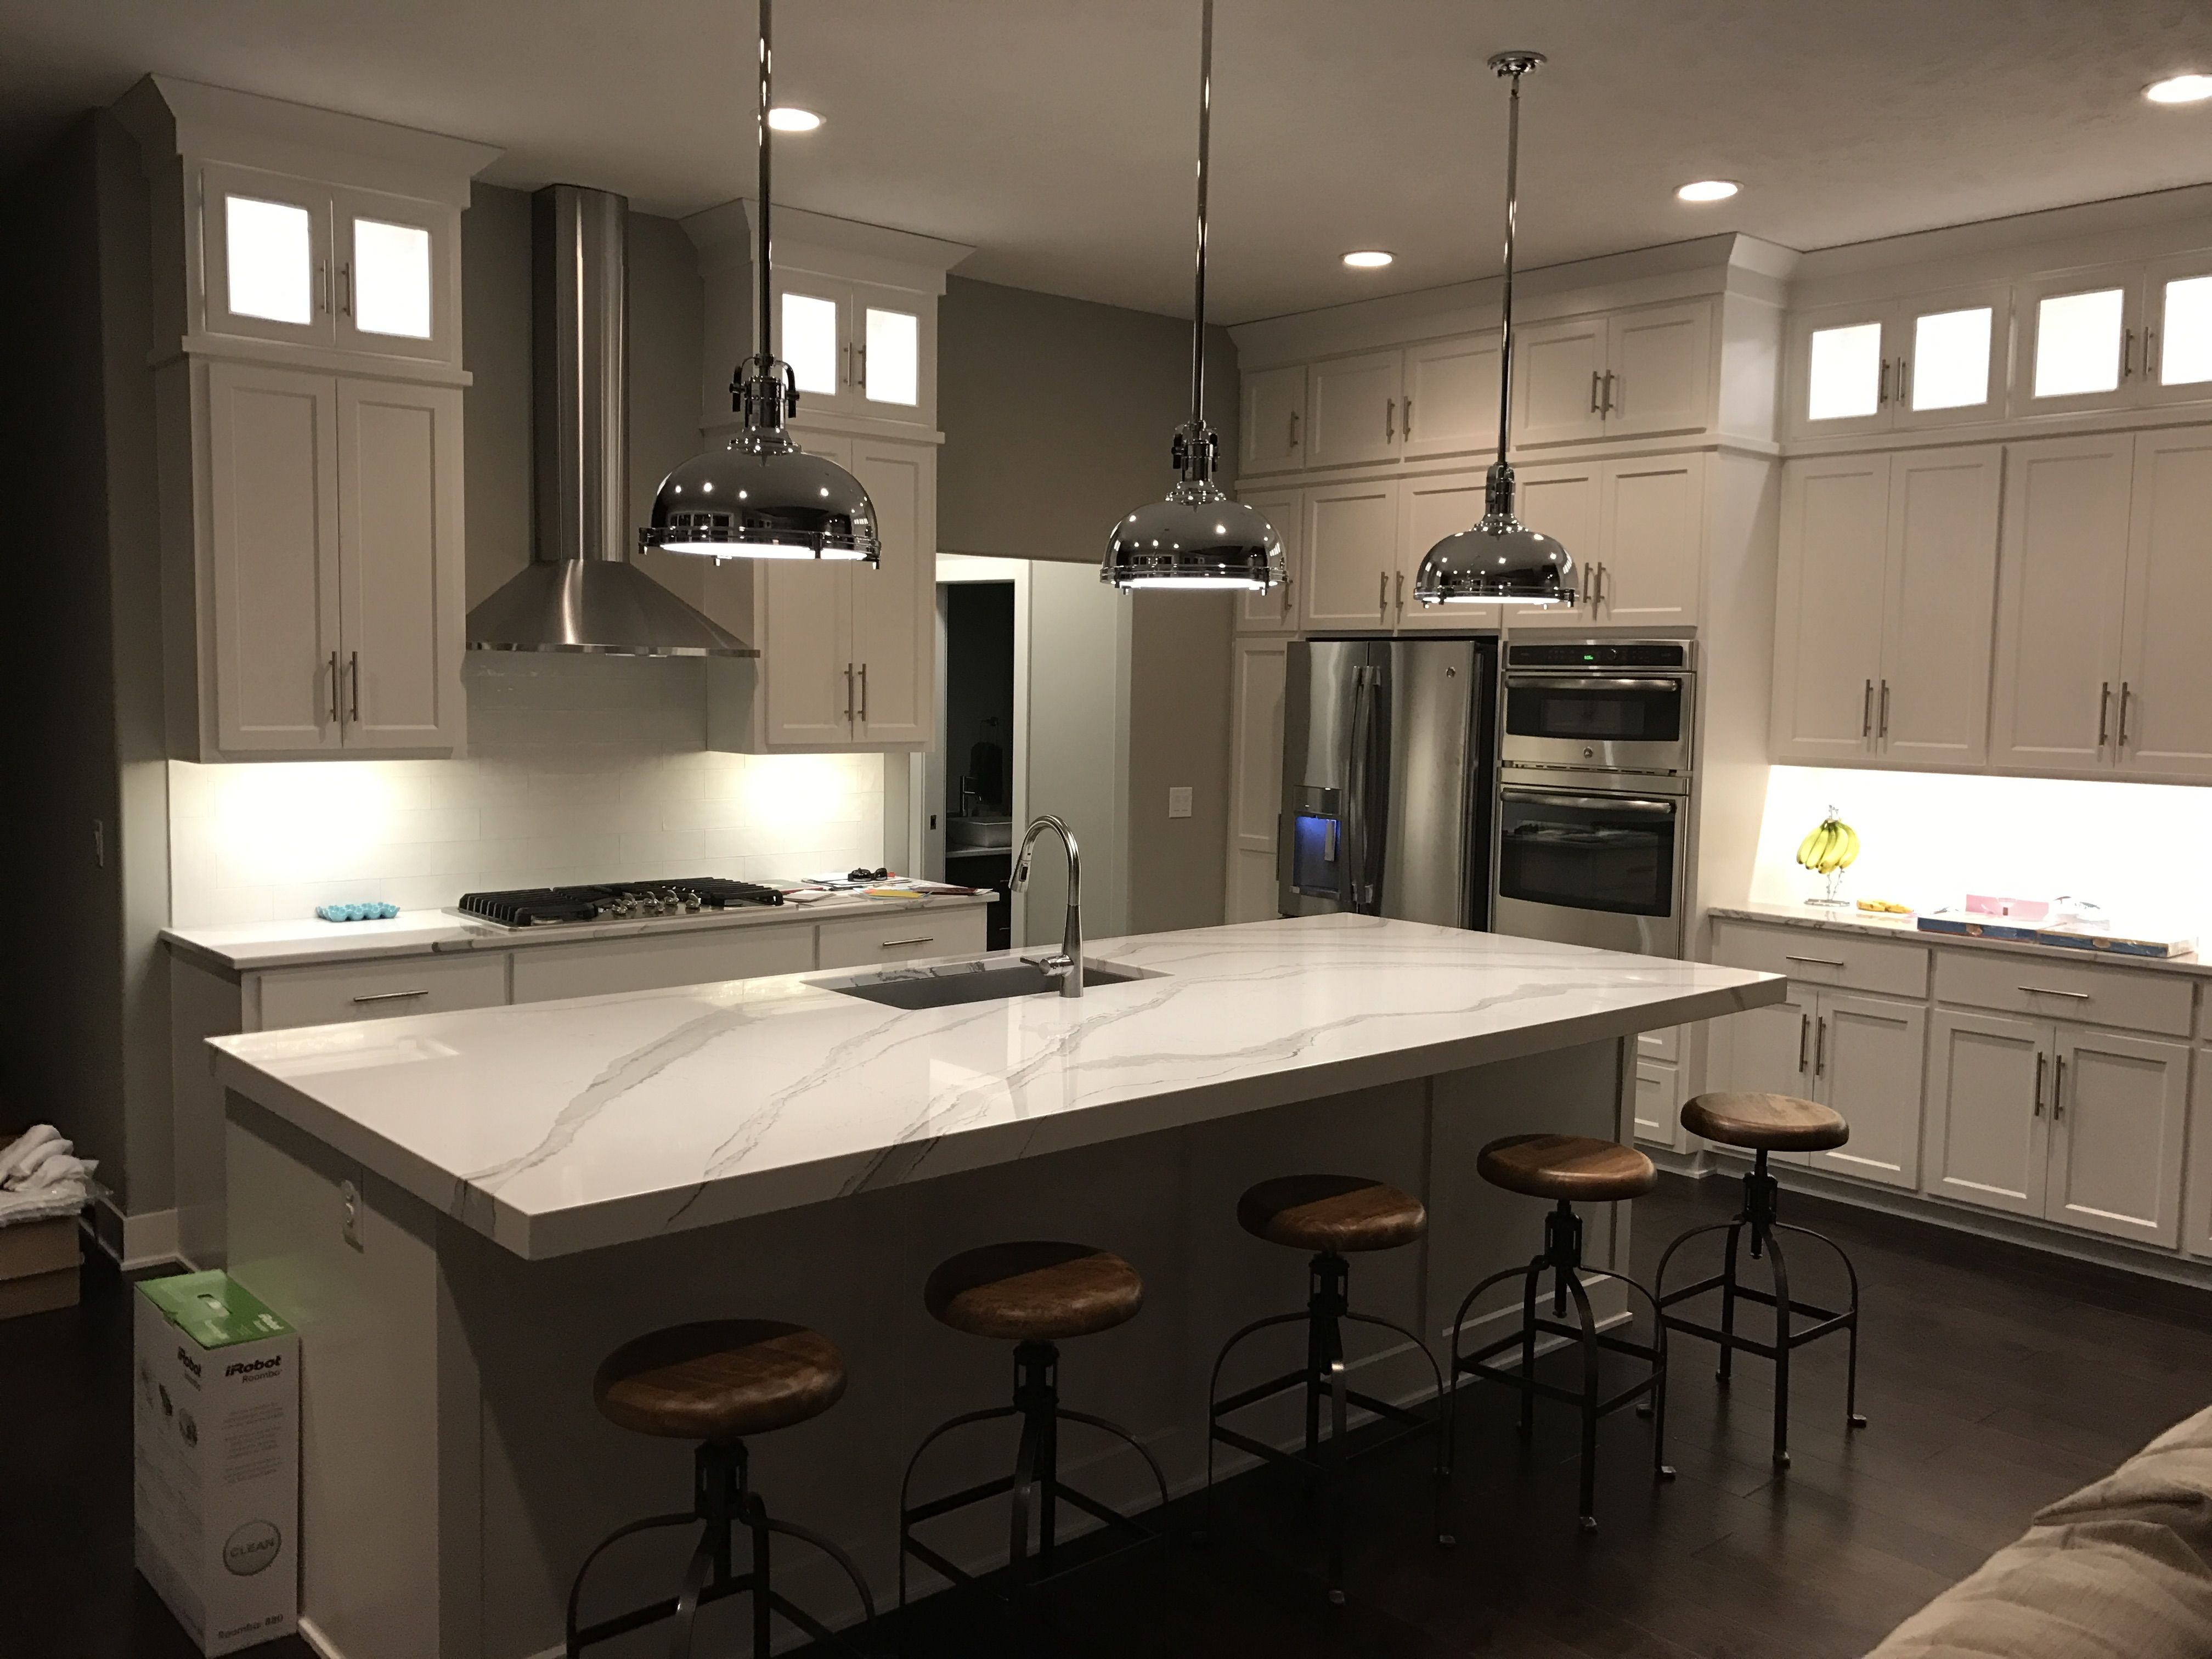 My Kitchen Design And Layout With 10 Foot Island Kitchen Design